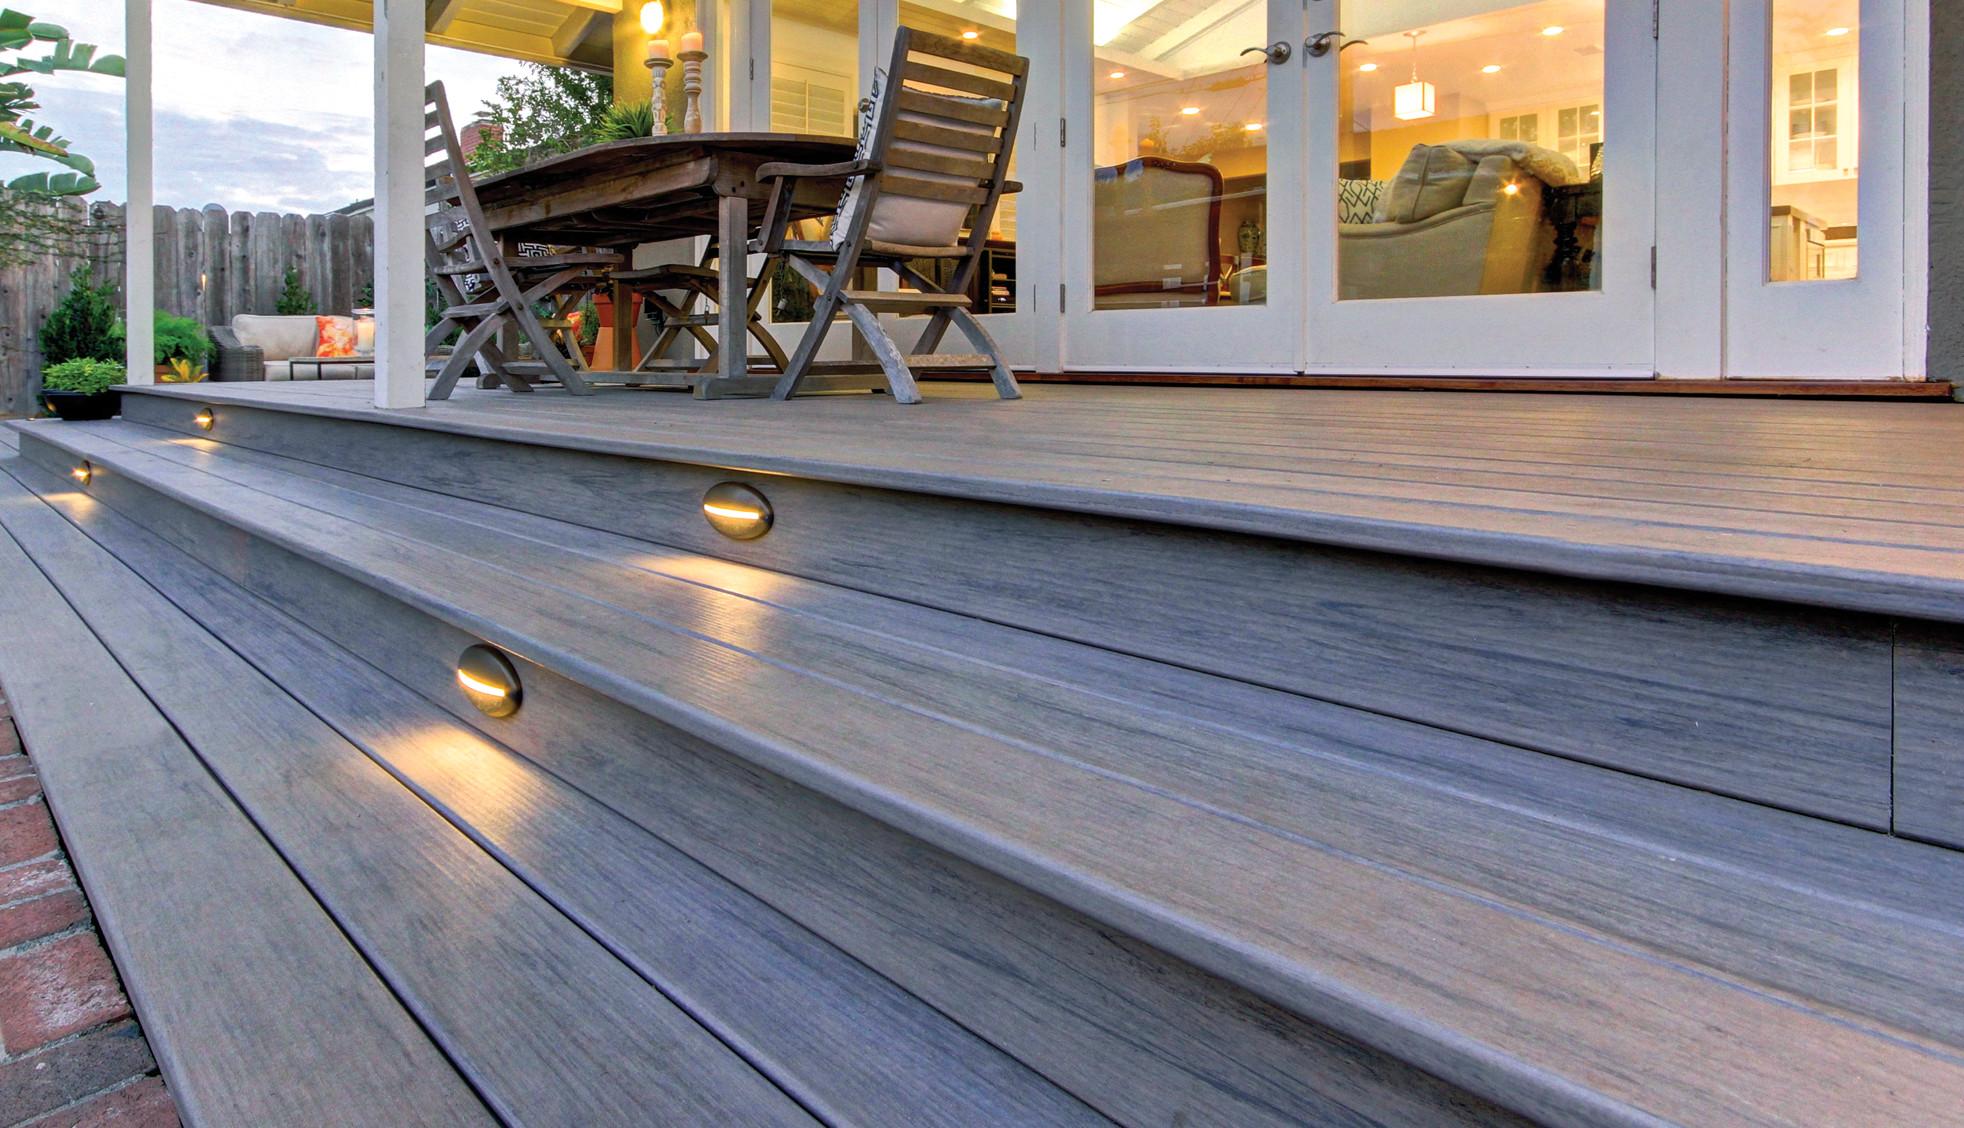 Soft Lighting for Deck Retreat